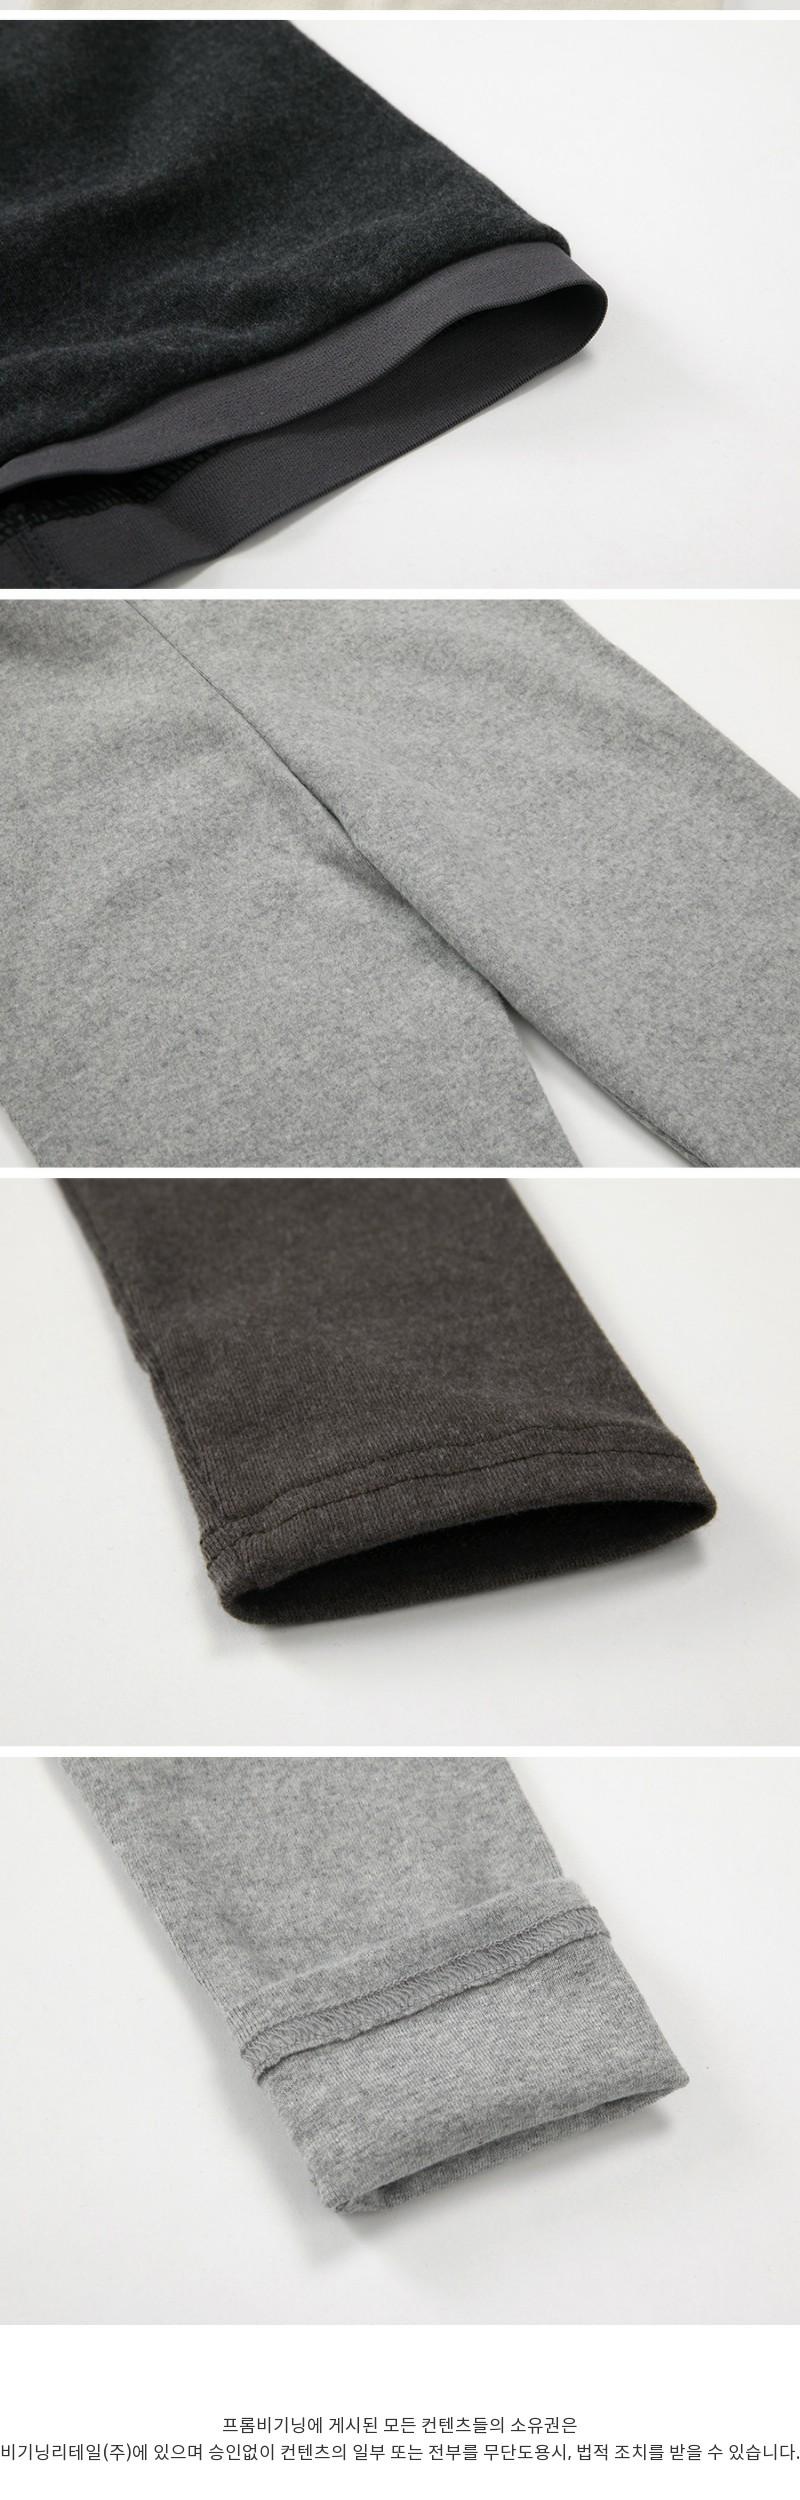 Basic tension leggings_S (size : one)